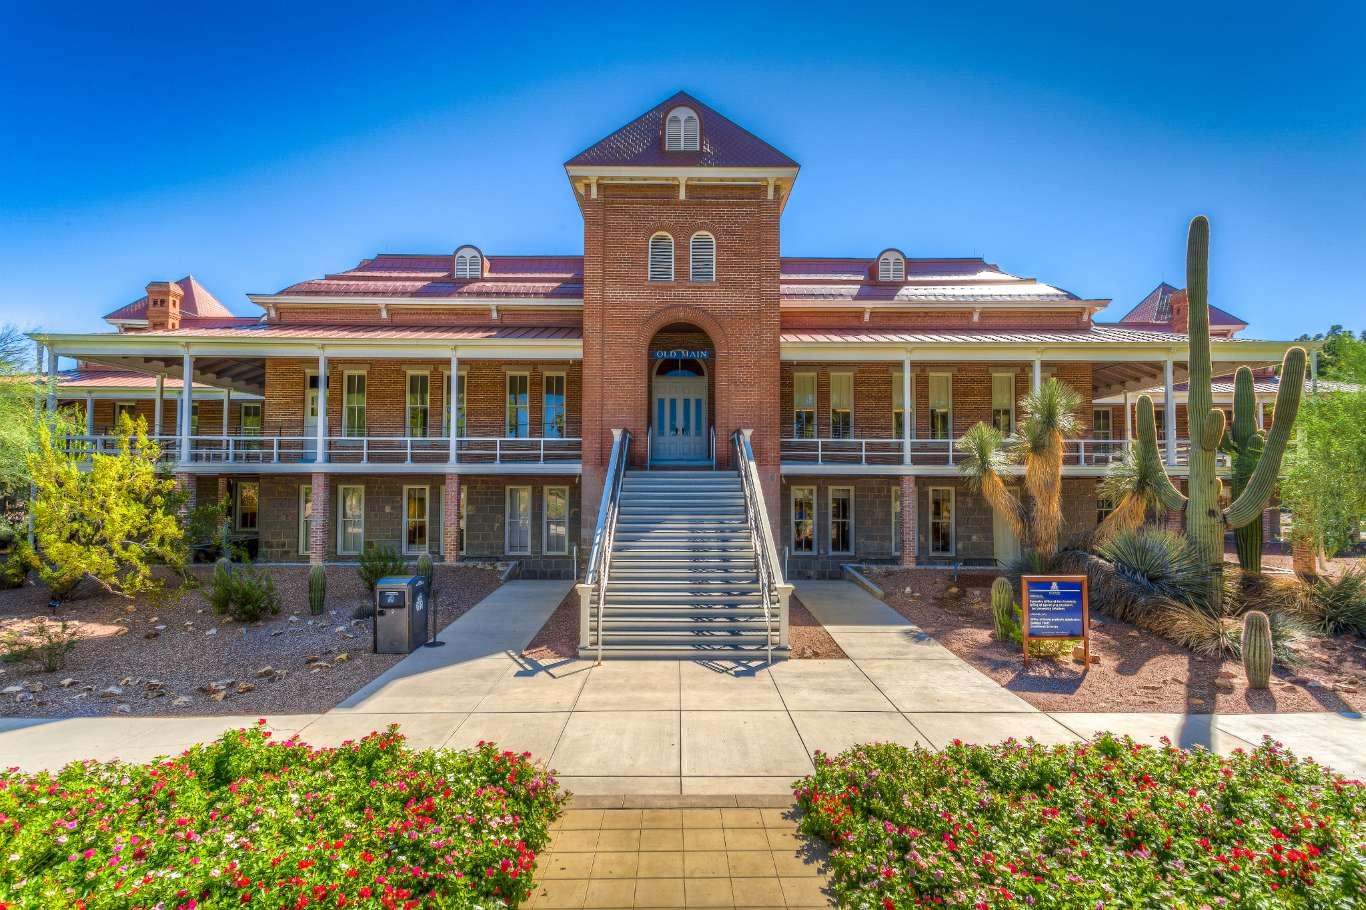 American Express & The University of Arizona | Arizona